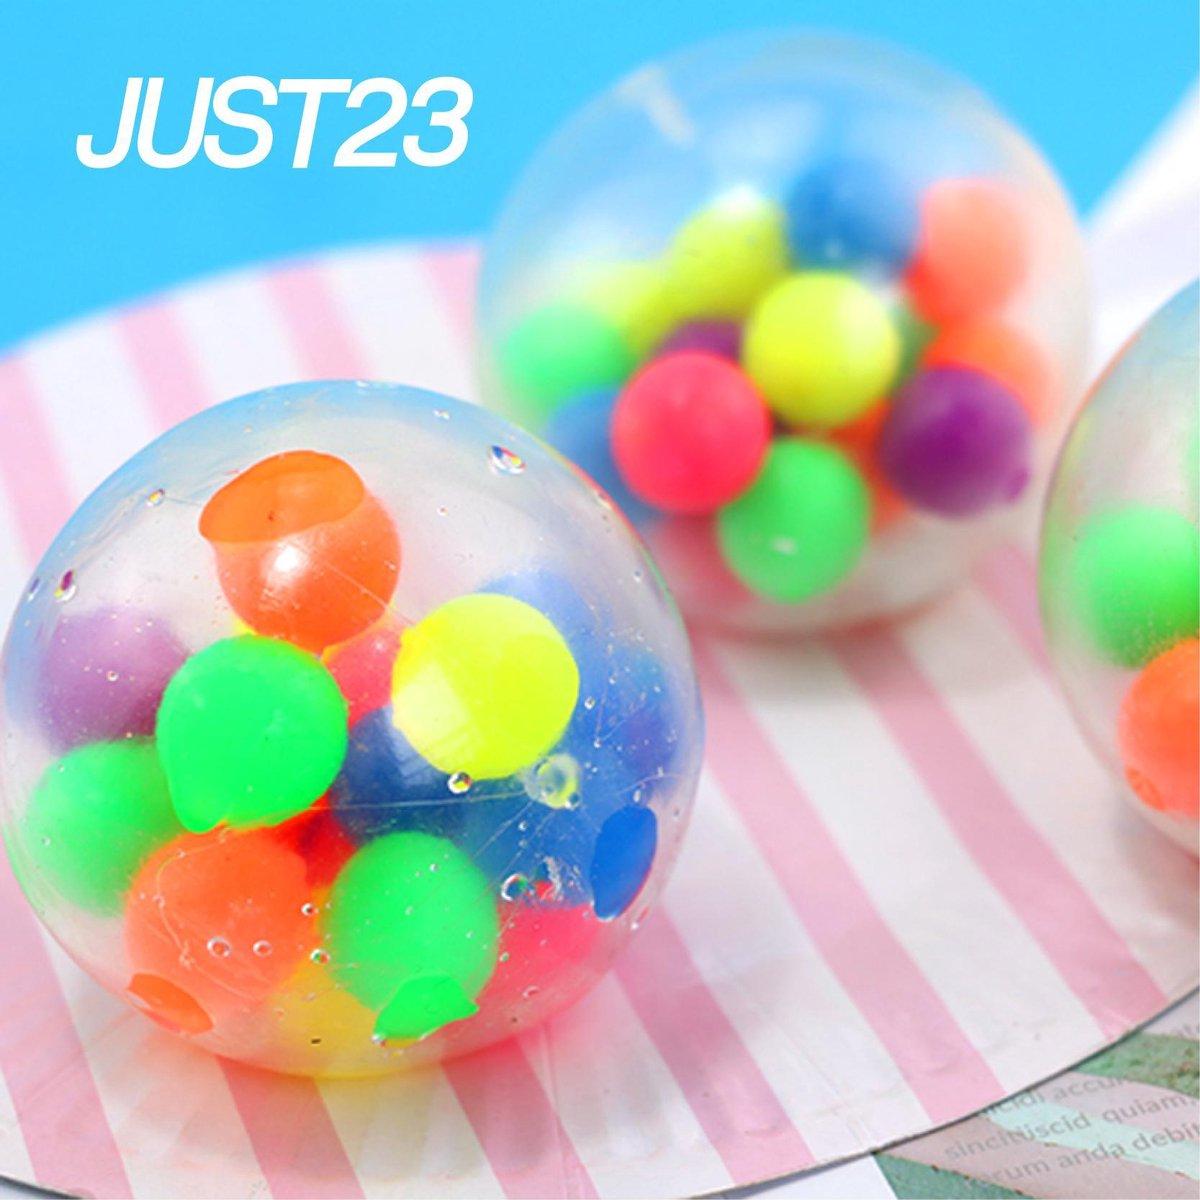 JUST23 DNA stress Ball - Fidget toys - Stressbal orbeez  - Regenboog